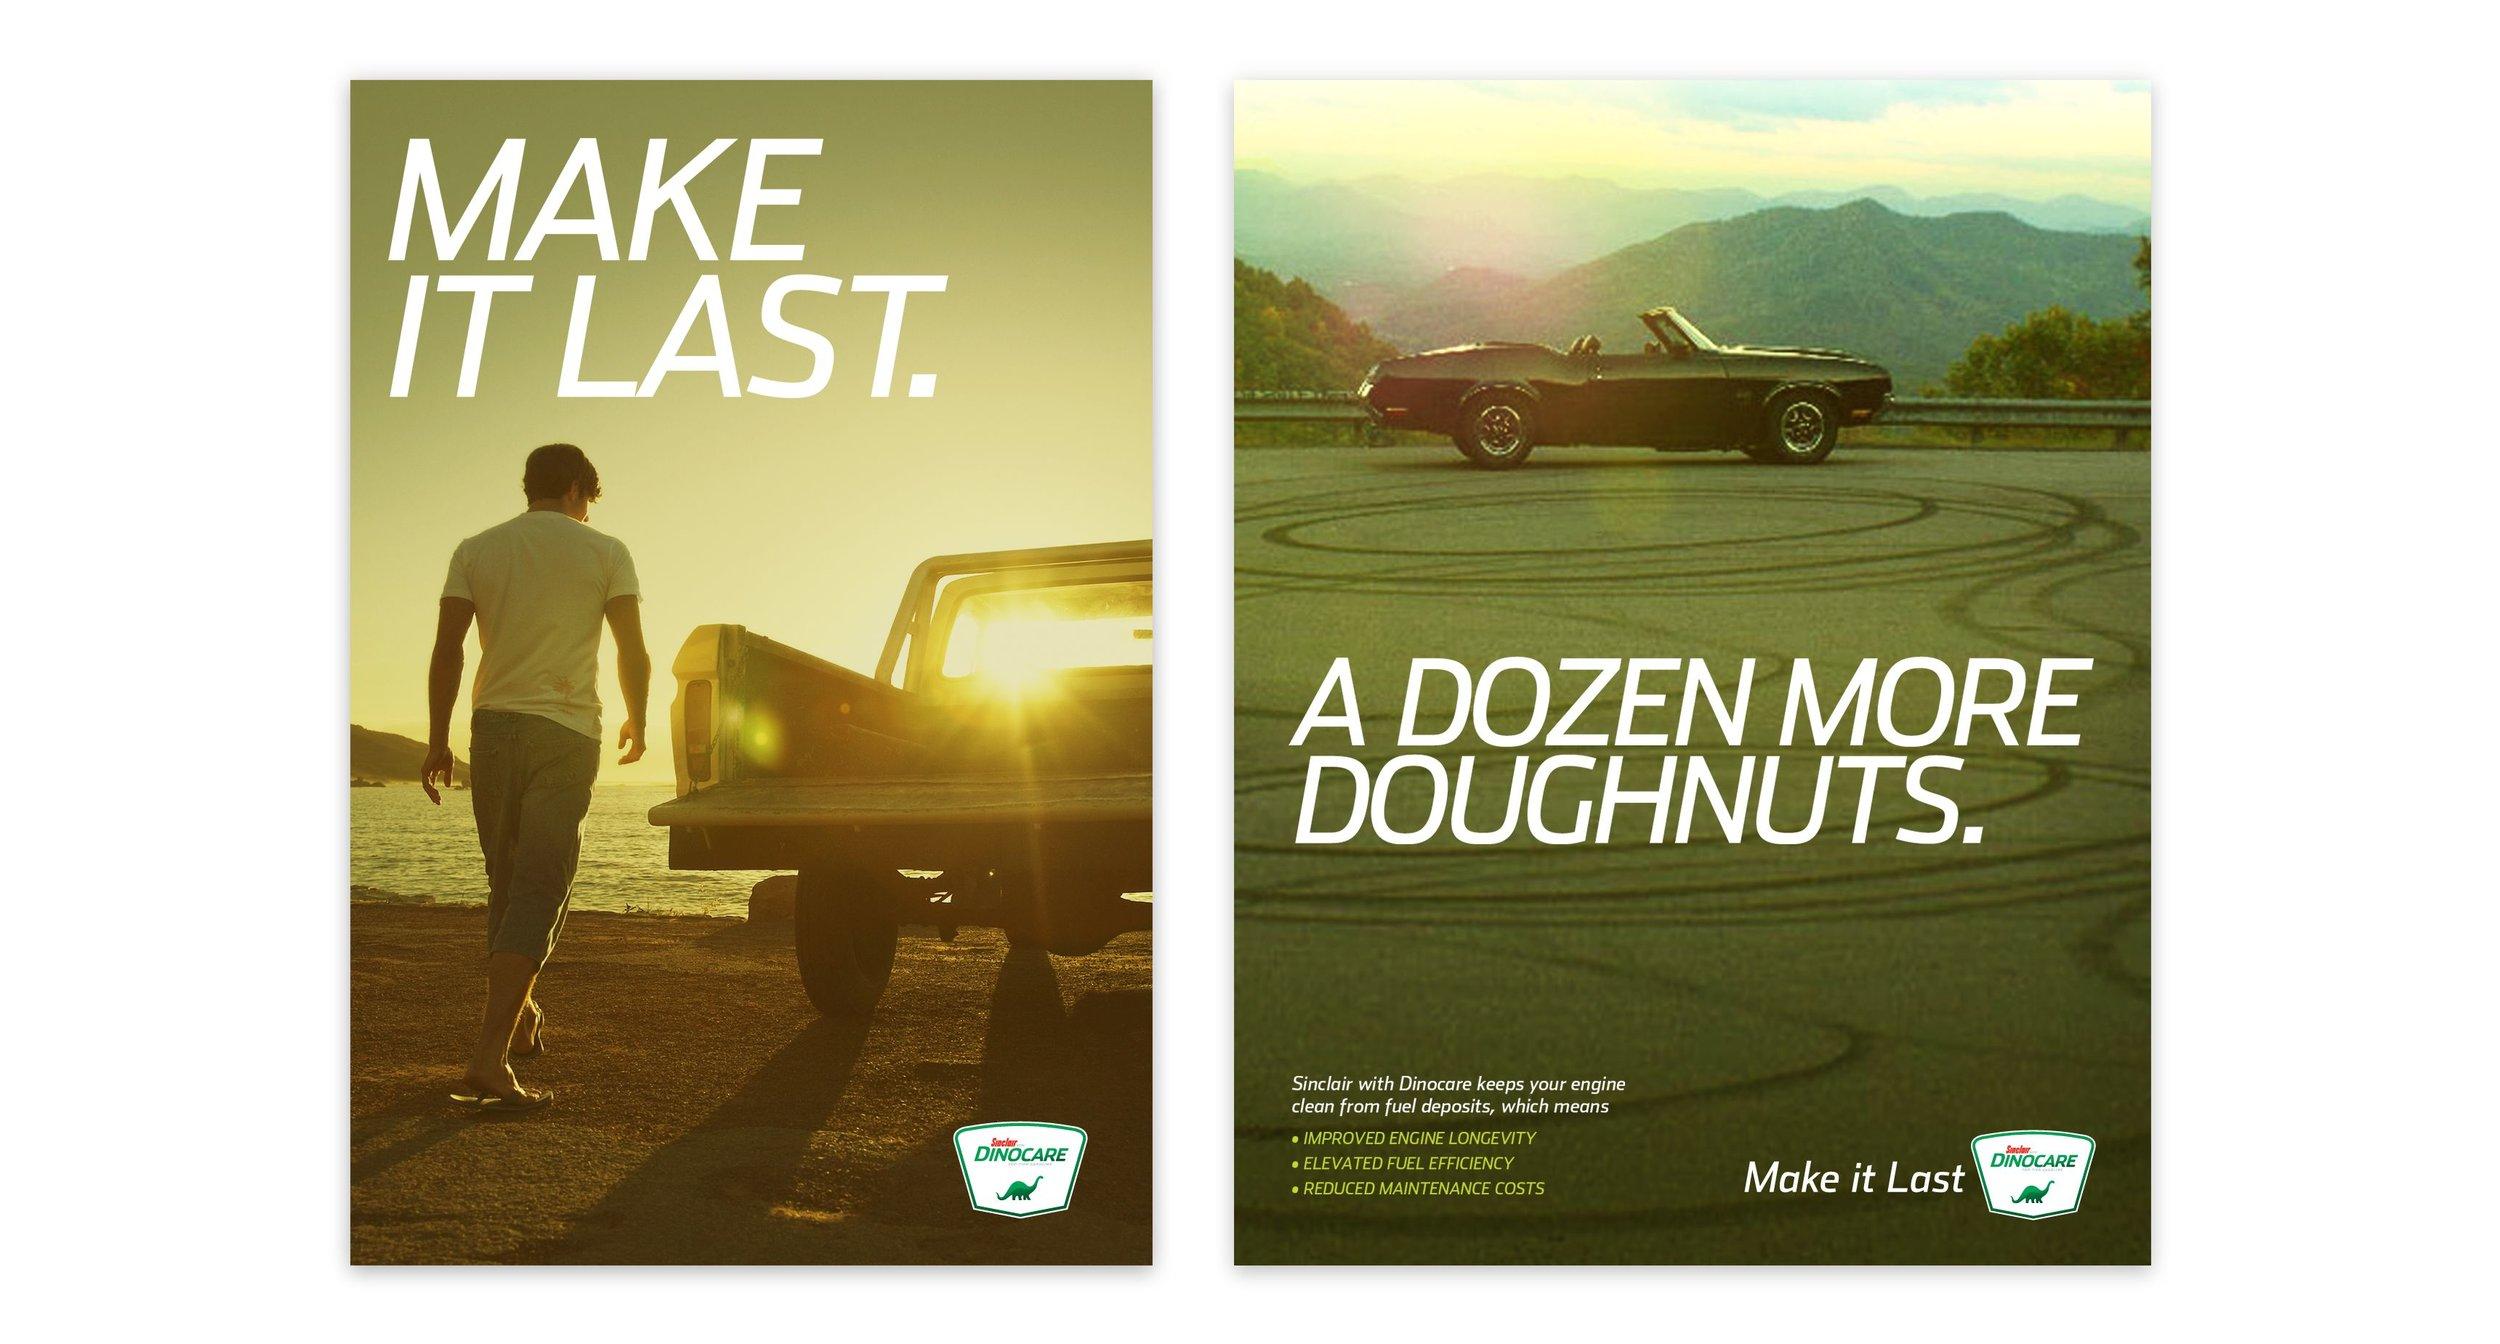 Make it Last & A Dozen More Doughnuts Advertisements